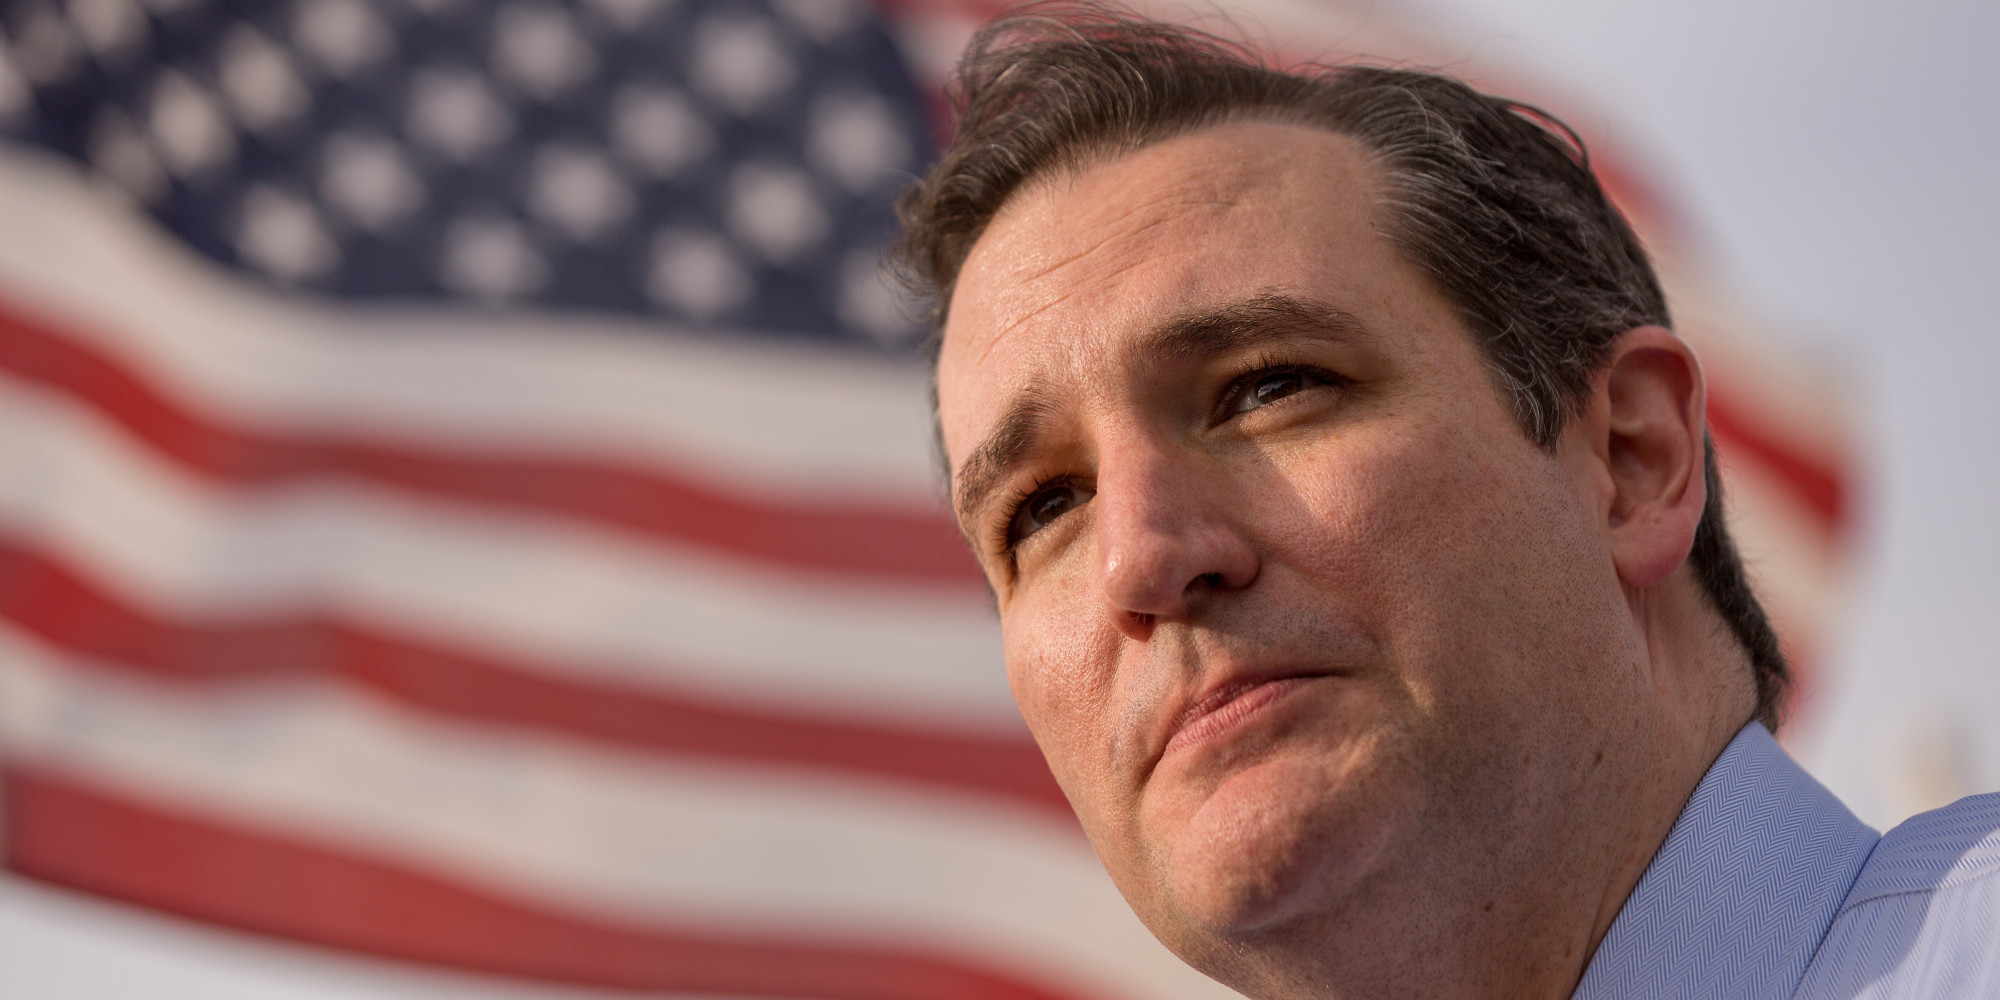 Ted Cruz HD Wallpaper